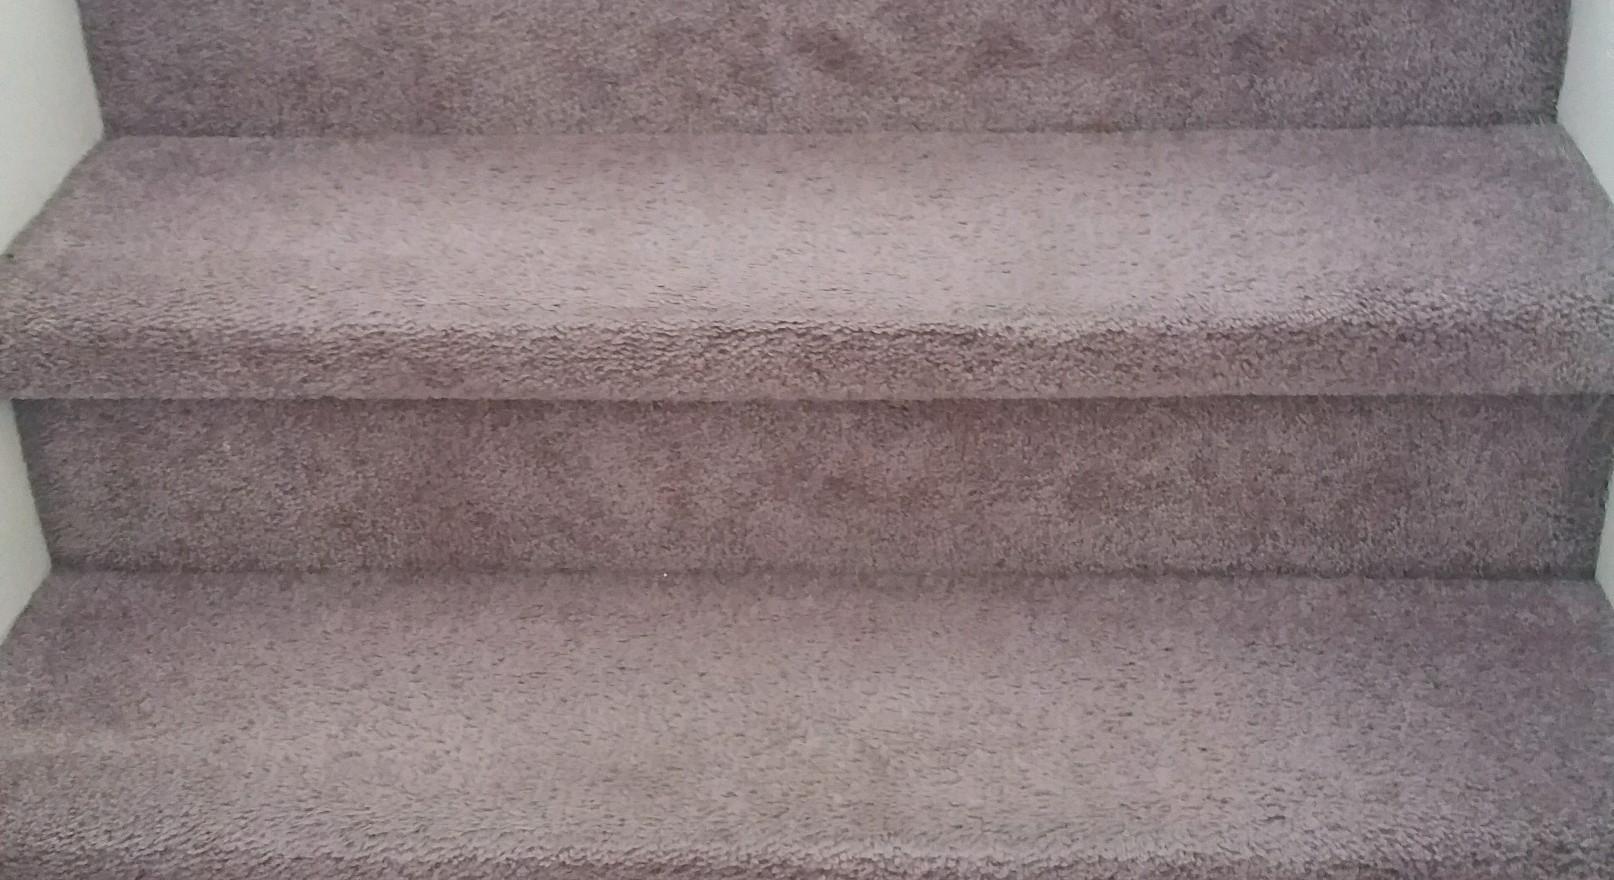 Carpet Cleaning in Wixom Michigan